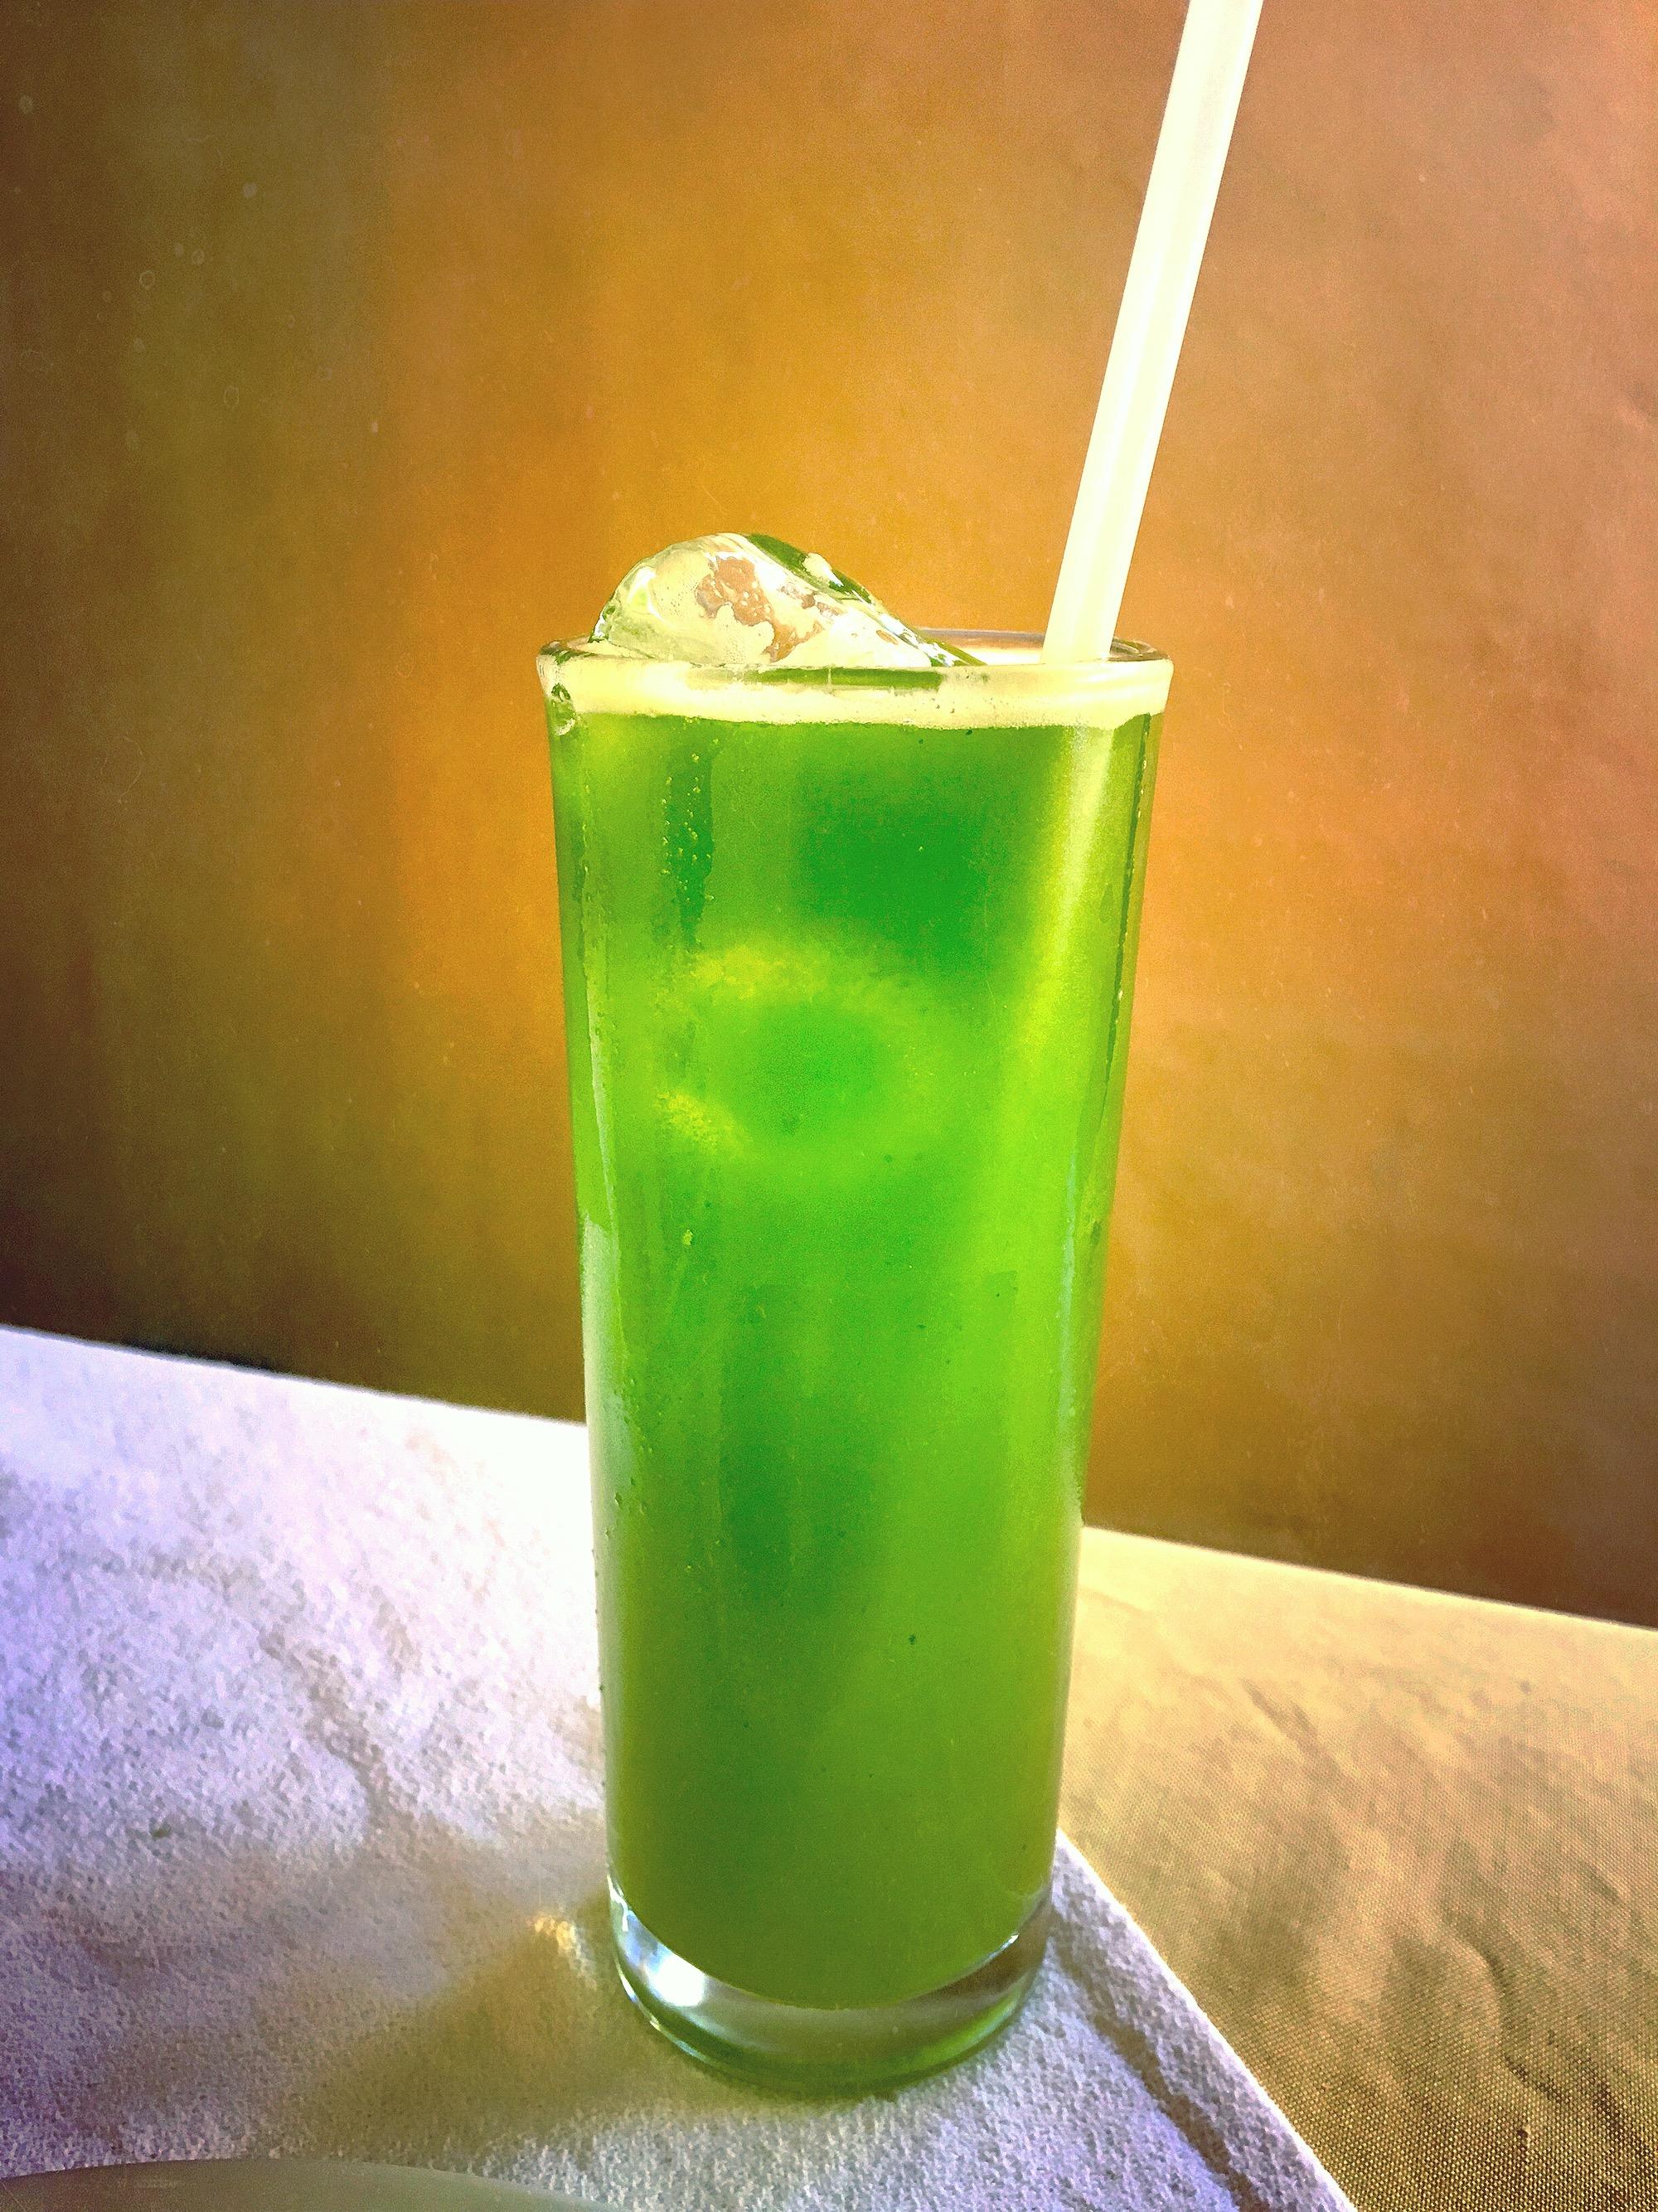 Jugo de Chaya (Chaya, Pineapple, and Orange Juice)